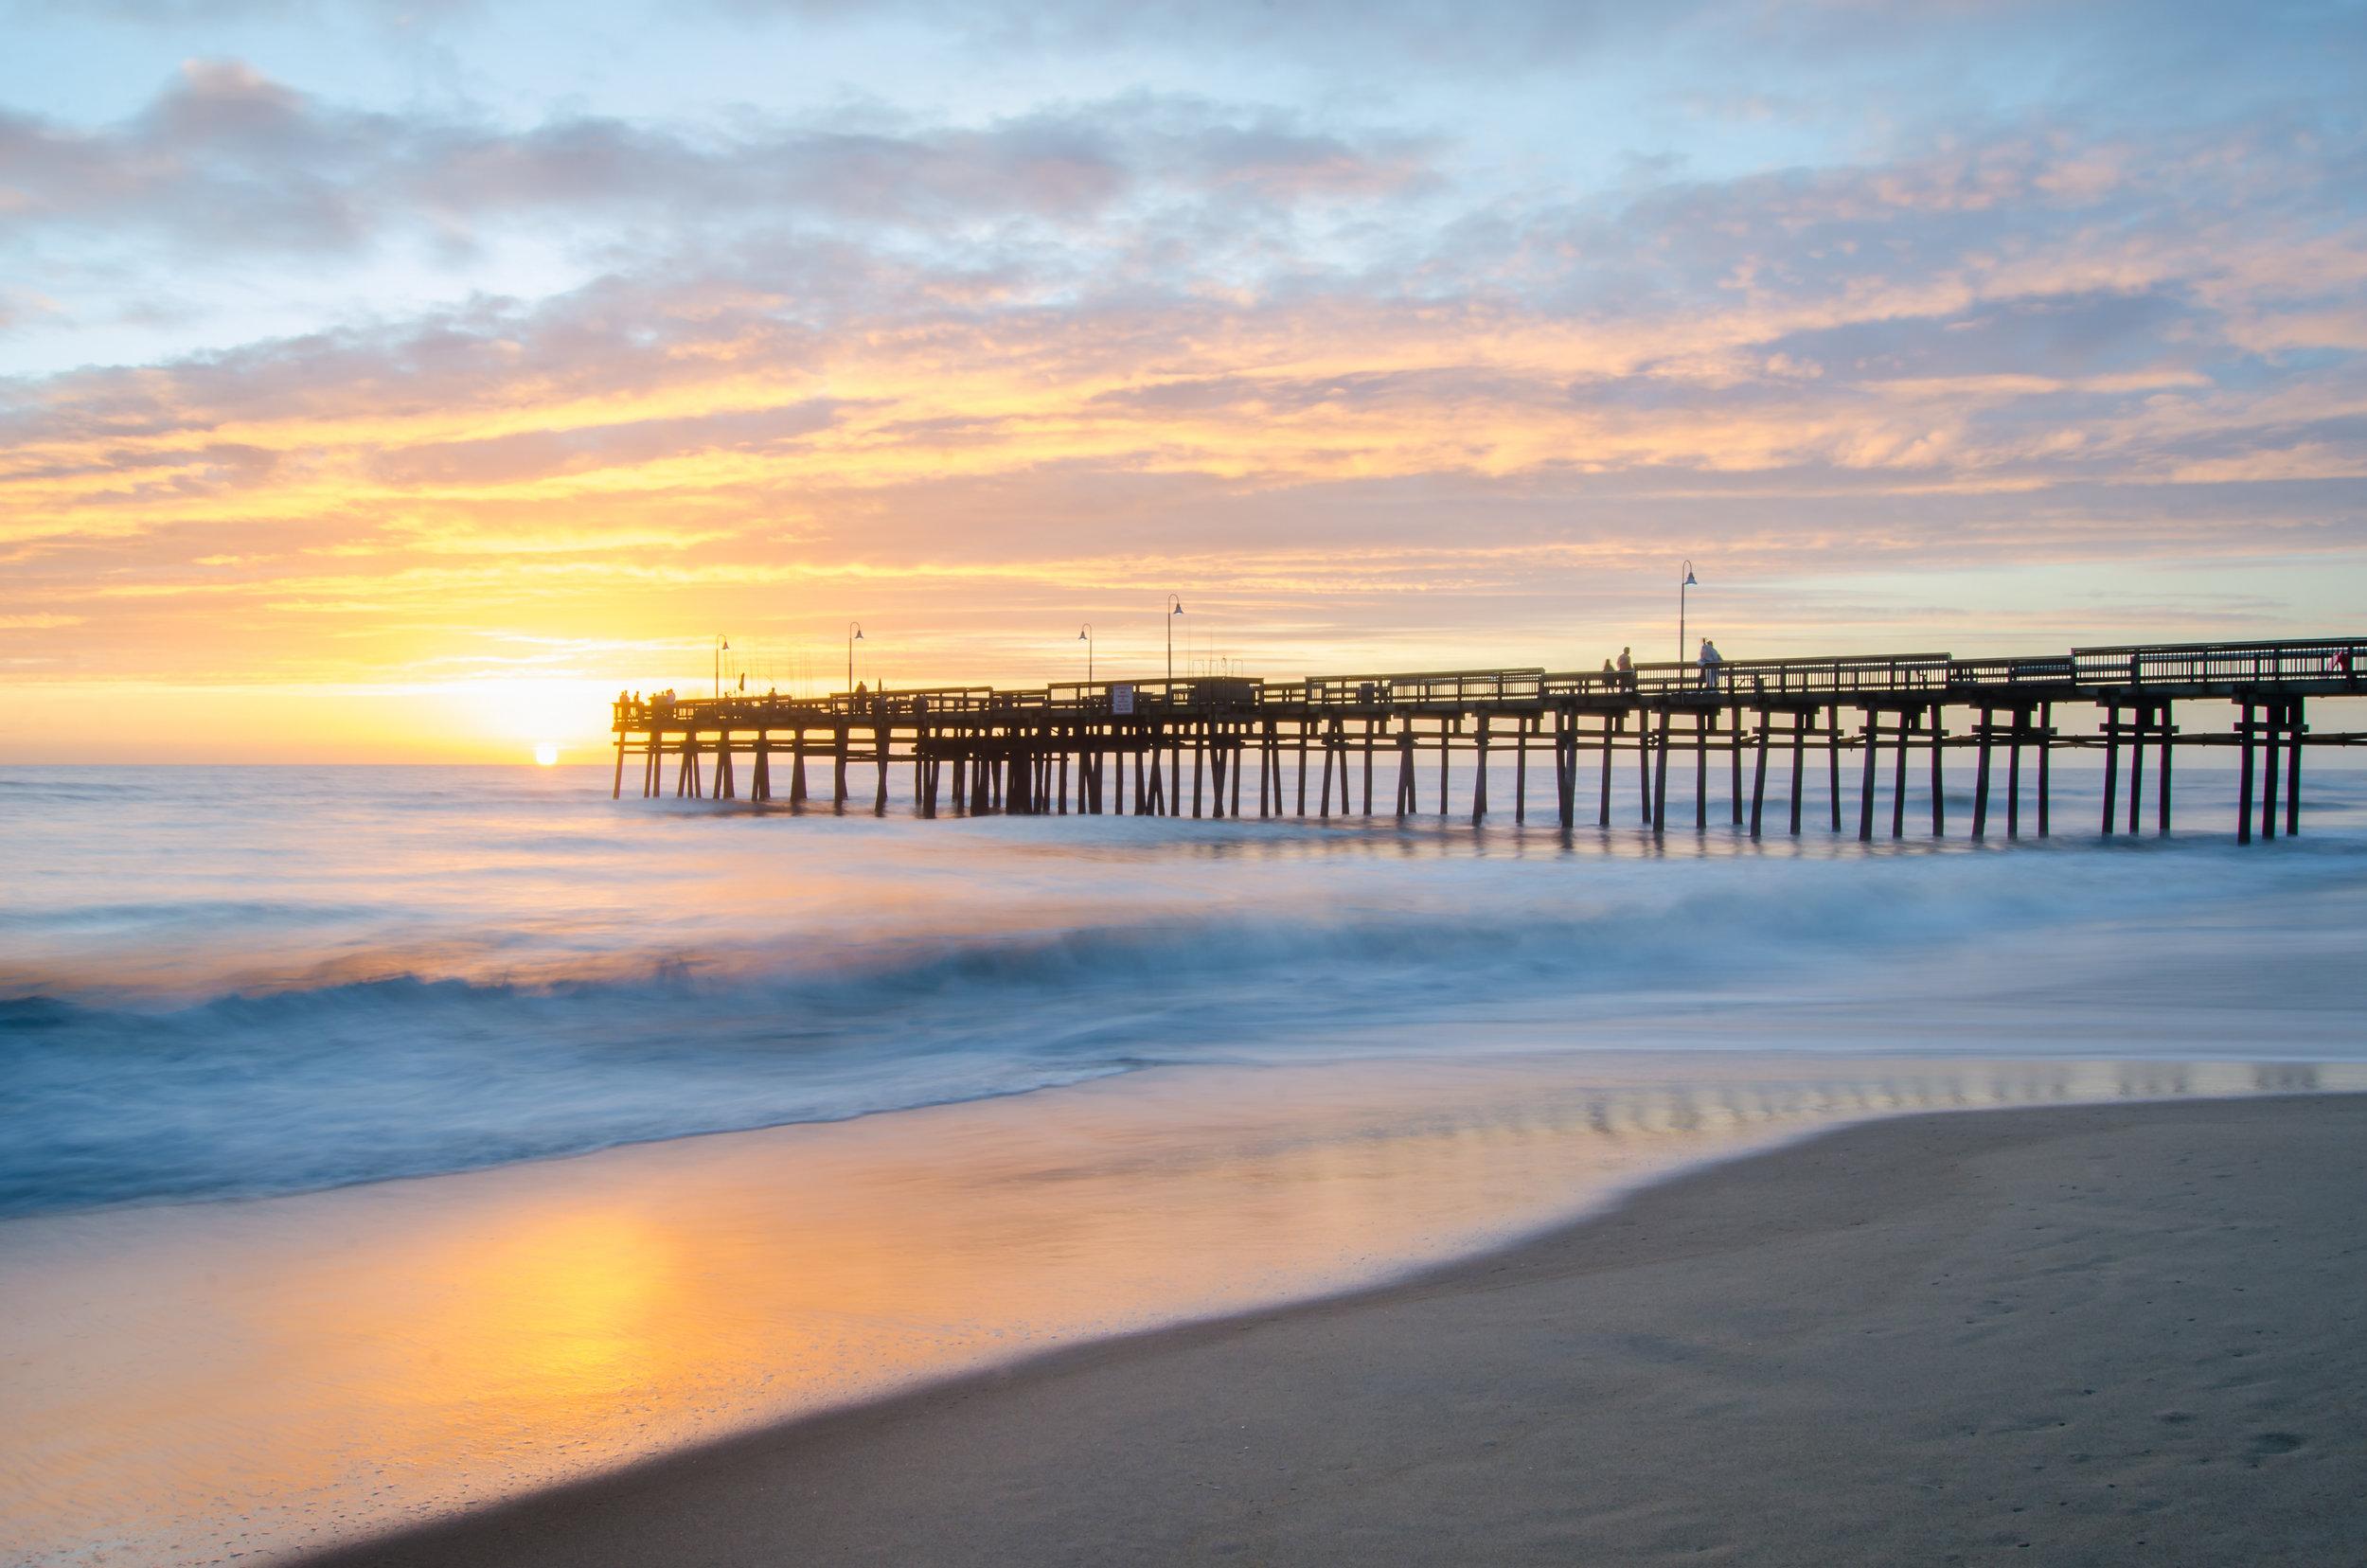 Beautiful, sunrise at Sandbridge Pier in Virginia Beach, Virginia.jpg